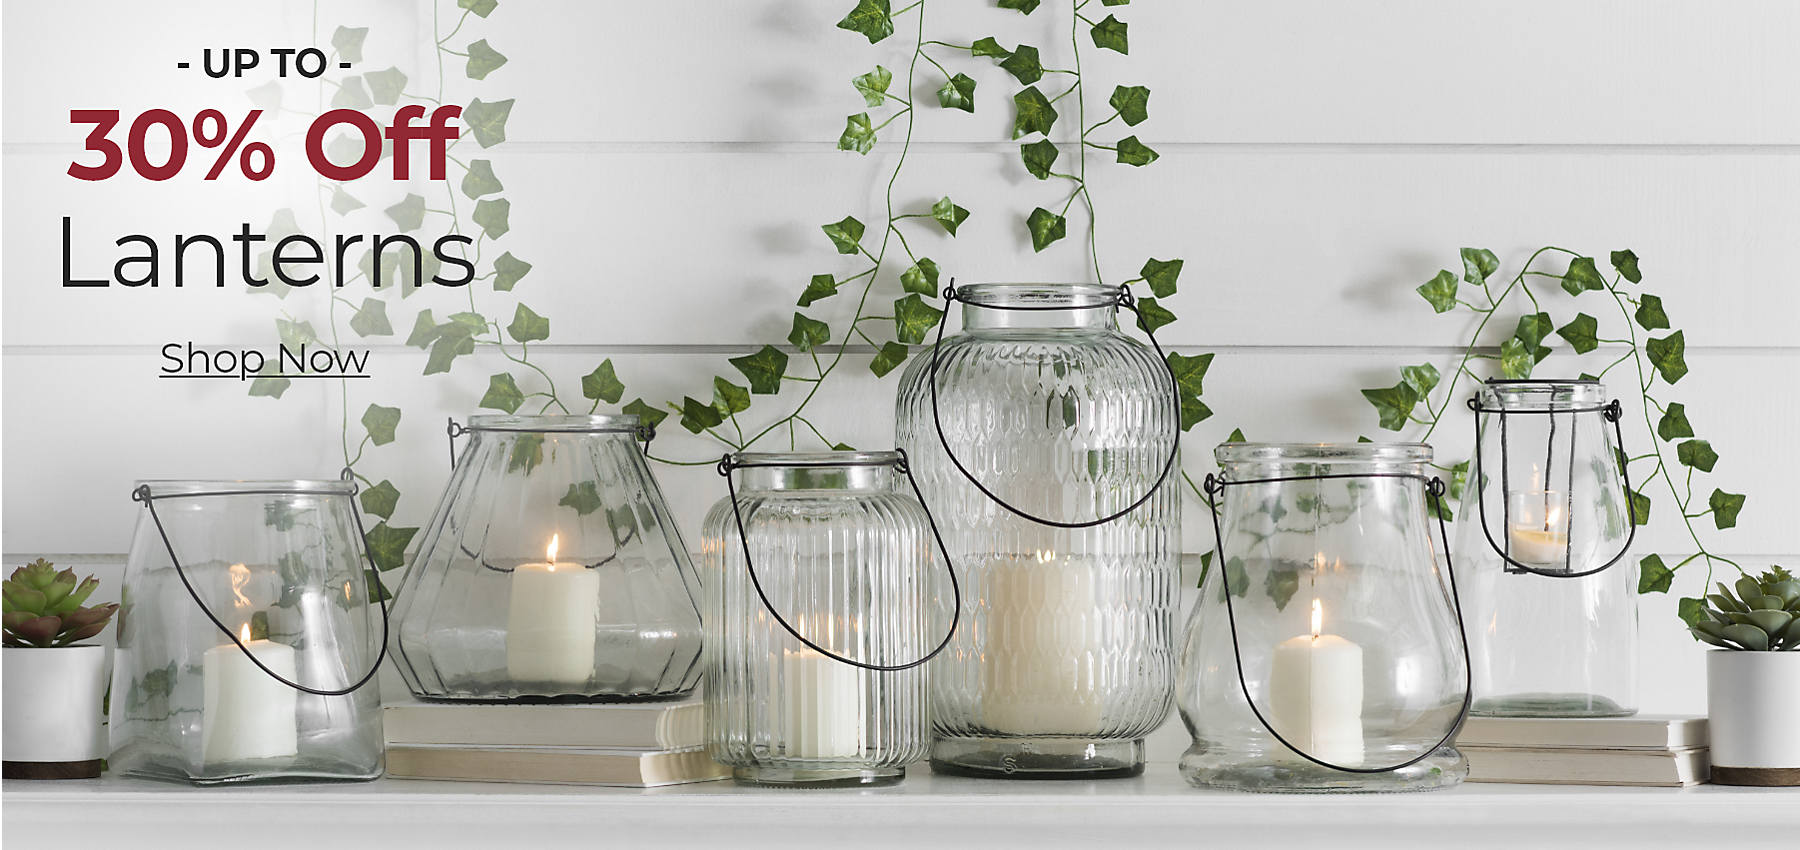 Lanterns Up to 30% Off